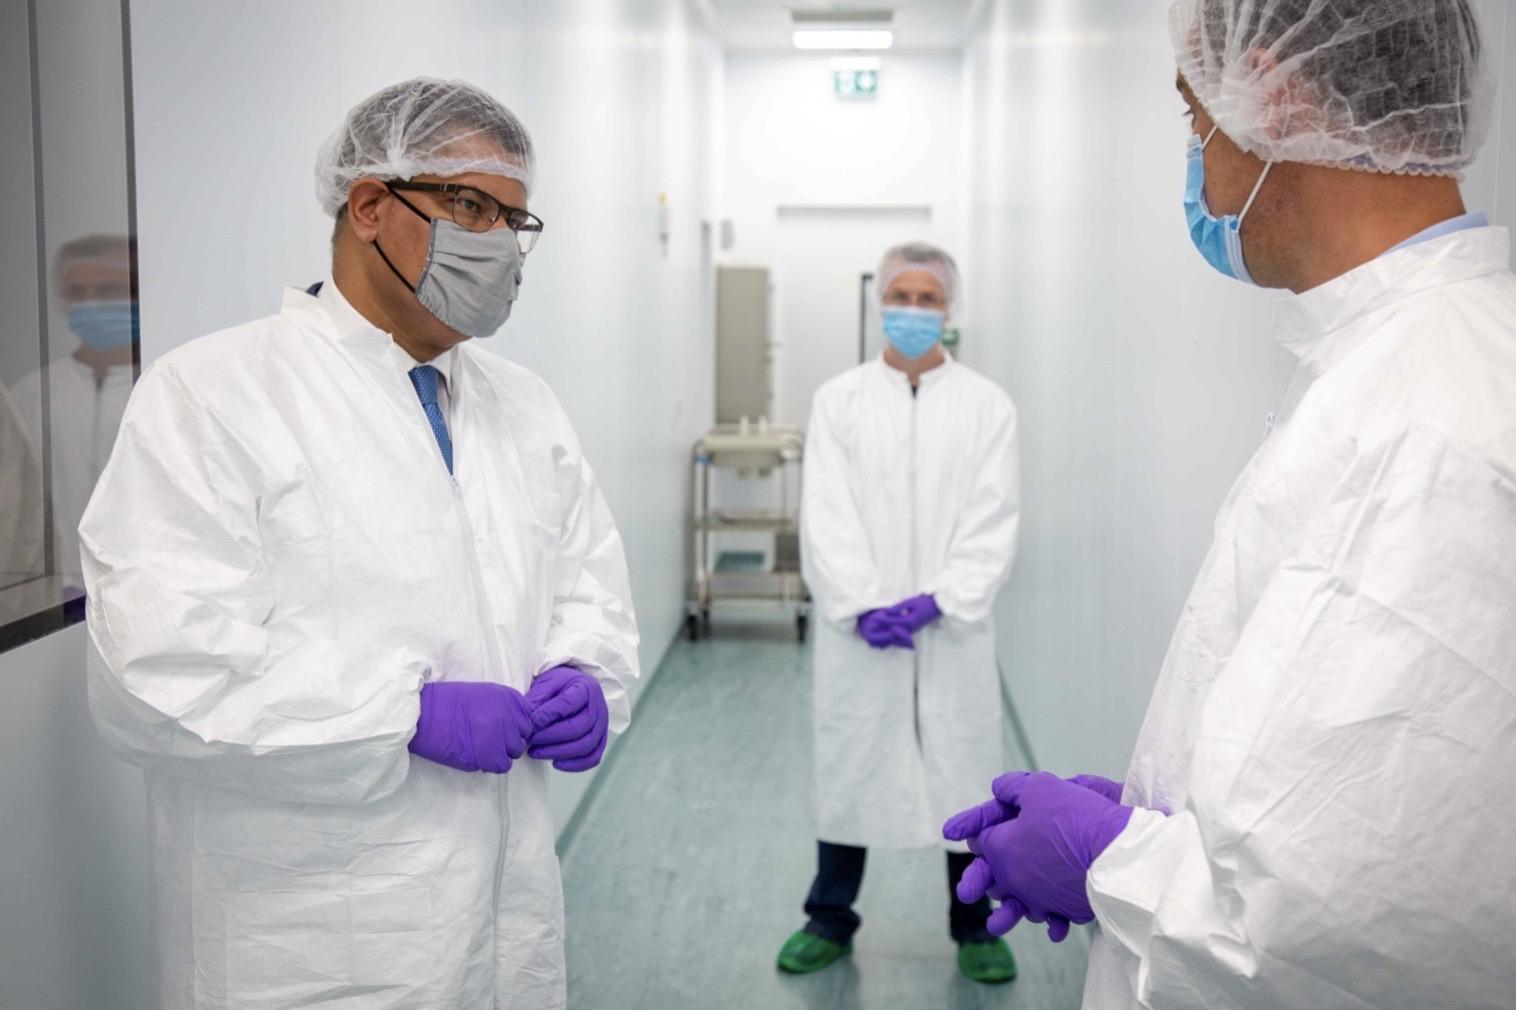 UK Business Secretary Alok Sharma on a visit to Valneva's facility in West Lothian